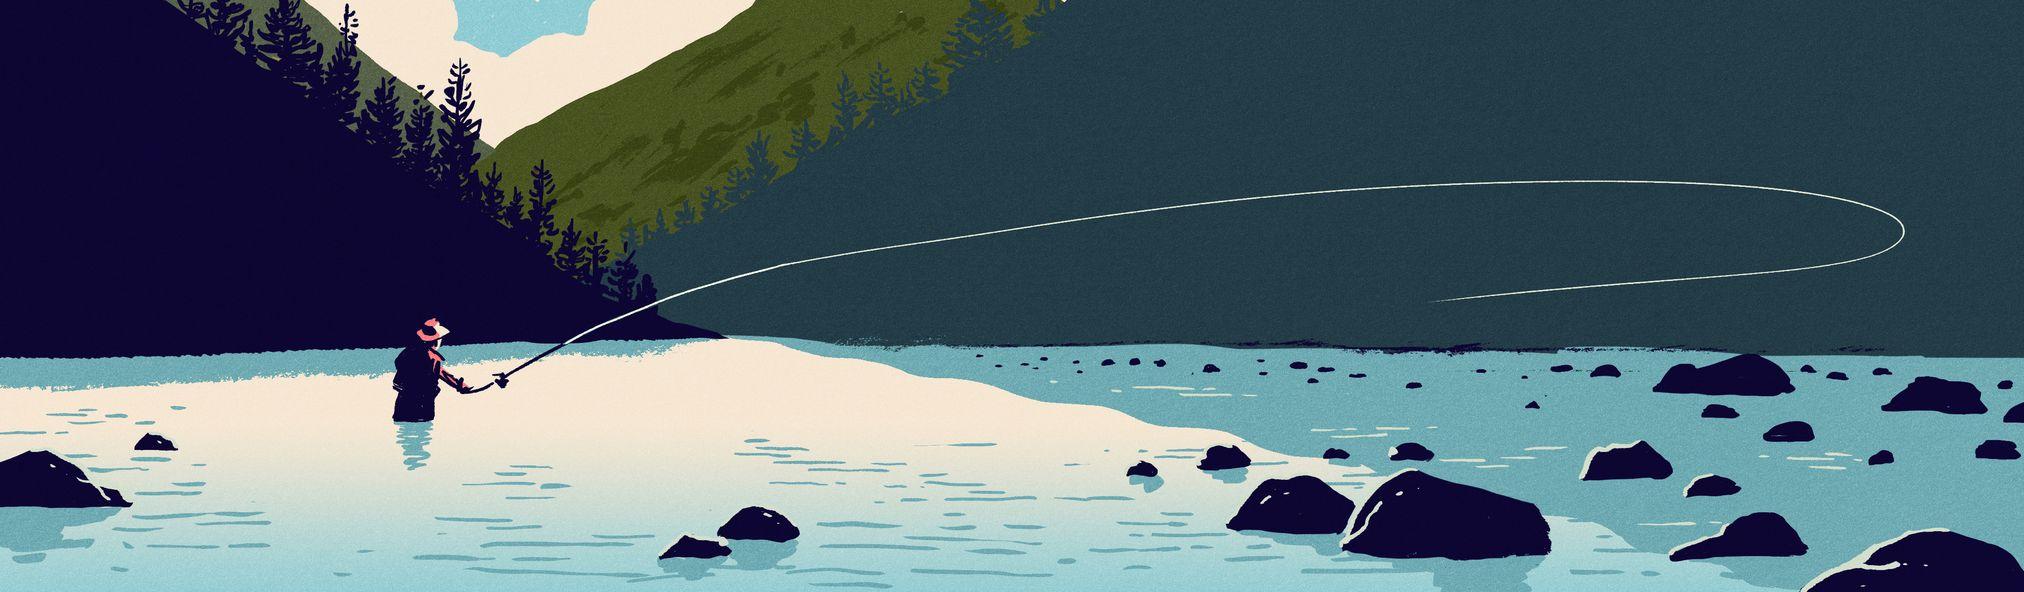 garance-illustration-jack-richardson-The-Boston-Globe-Fishing